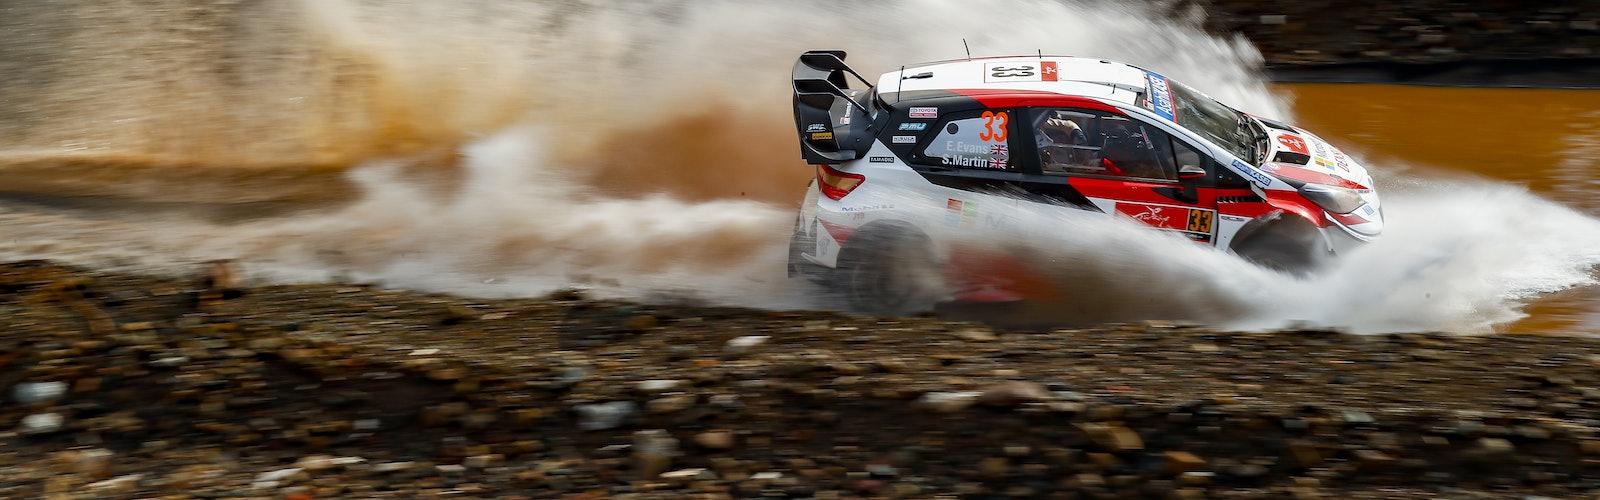 WRC_2020_Rd.5_168